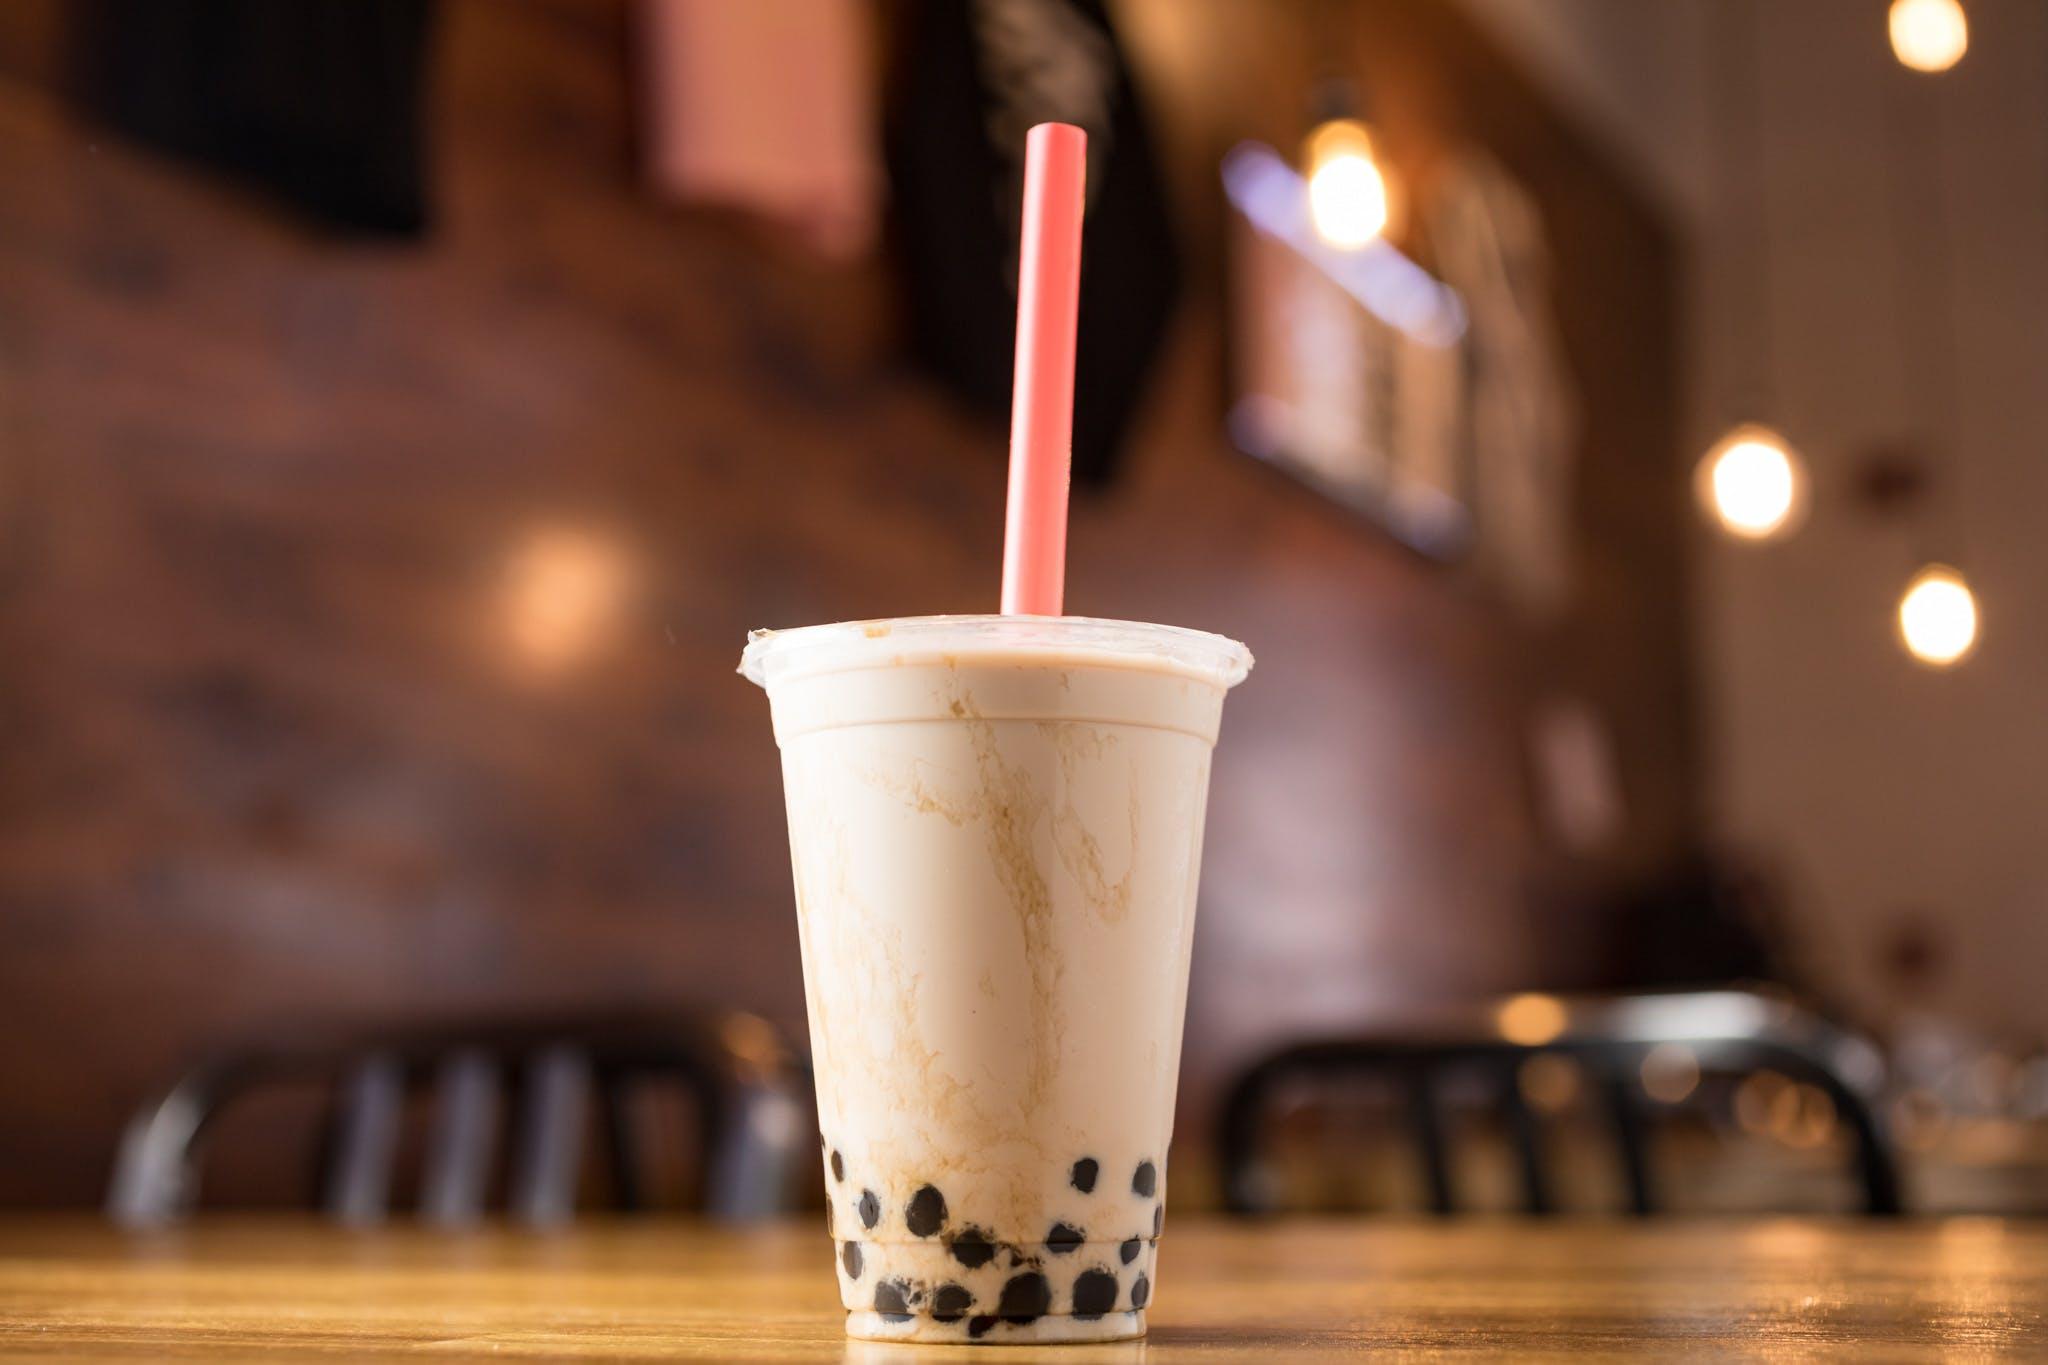 Bubble Milk Black Tea from KBG Korean BBQ & Grill in New Brunswick, NJ